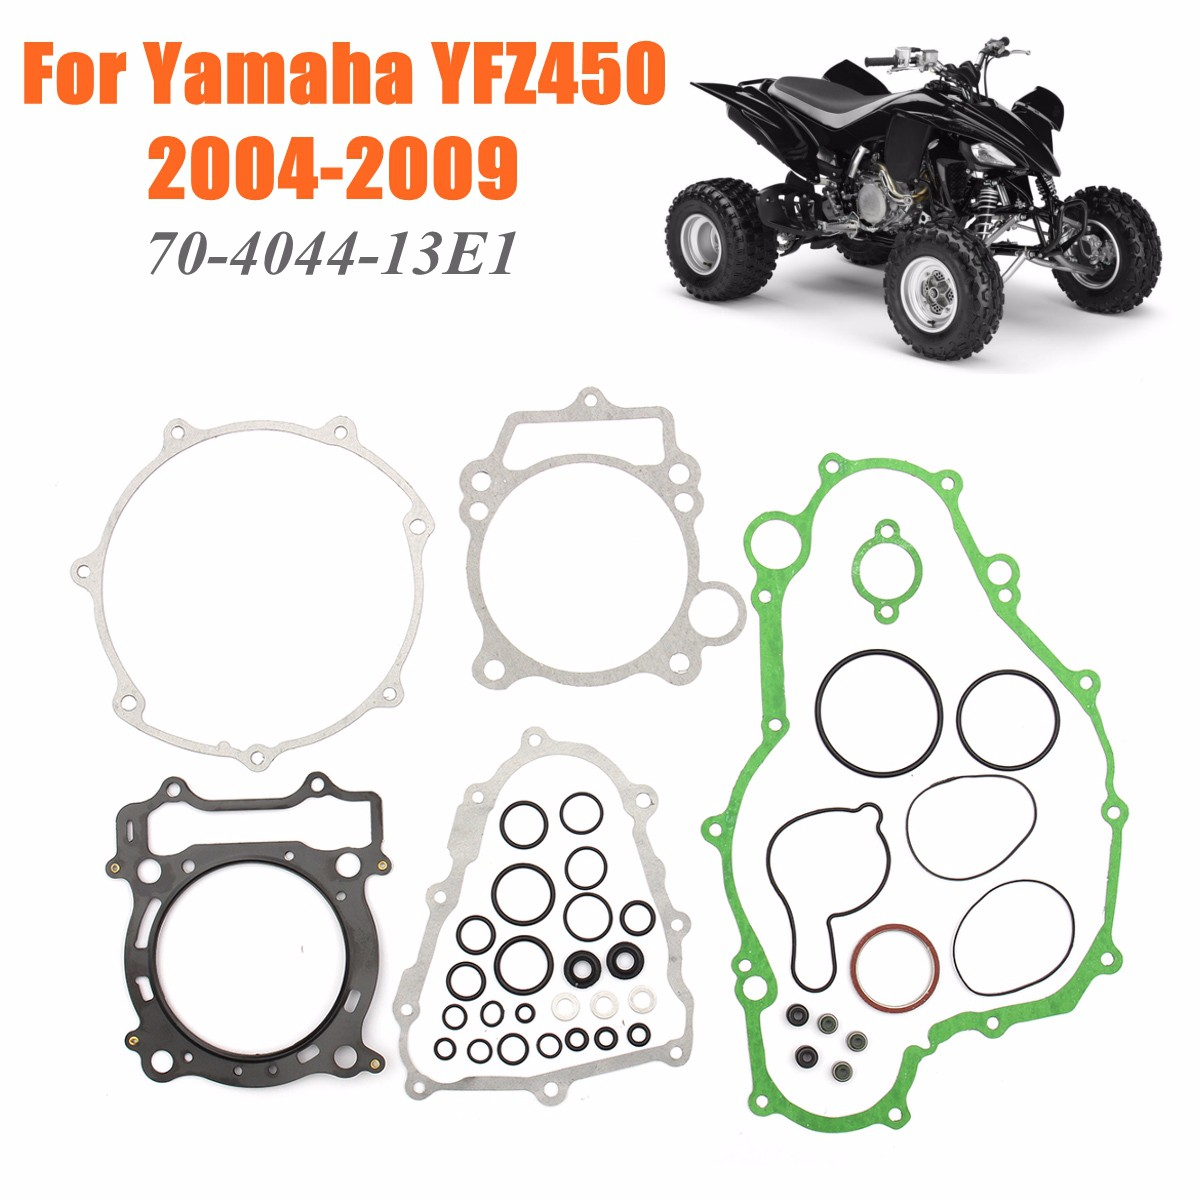 FOR YAMAHA YFZ450 YFZ 450 2012-2013 STEERING STEM SHAFT